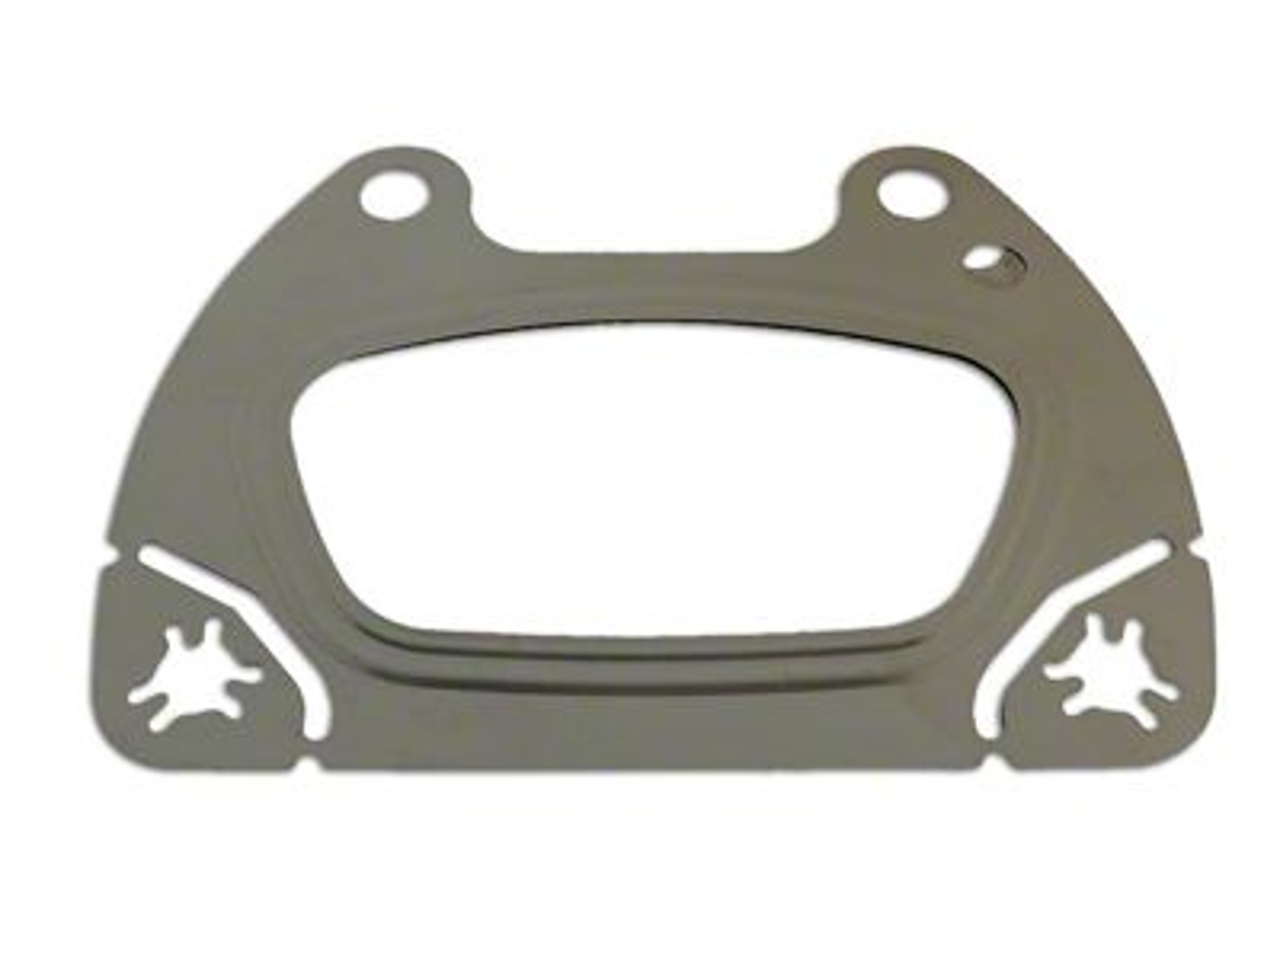 Omix-ADA Exhaust Manifold Gasket (12-18 3.6L Jeep Wrangler JK)